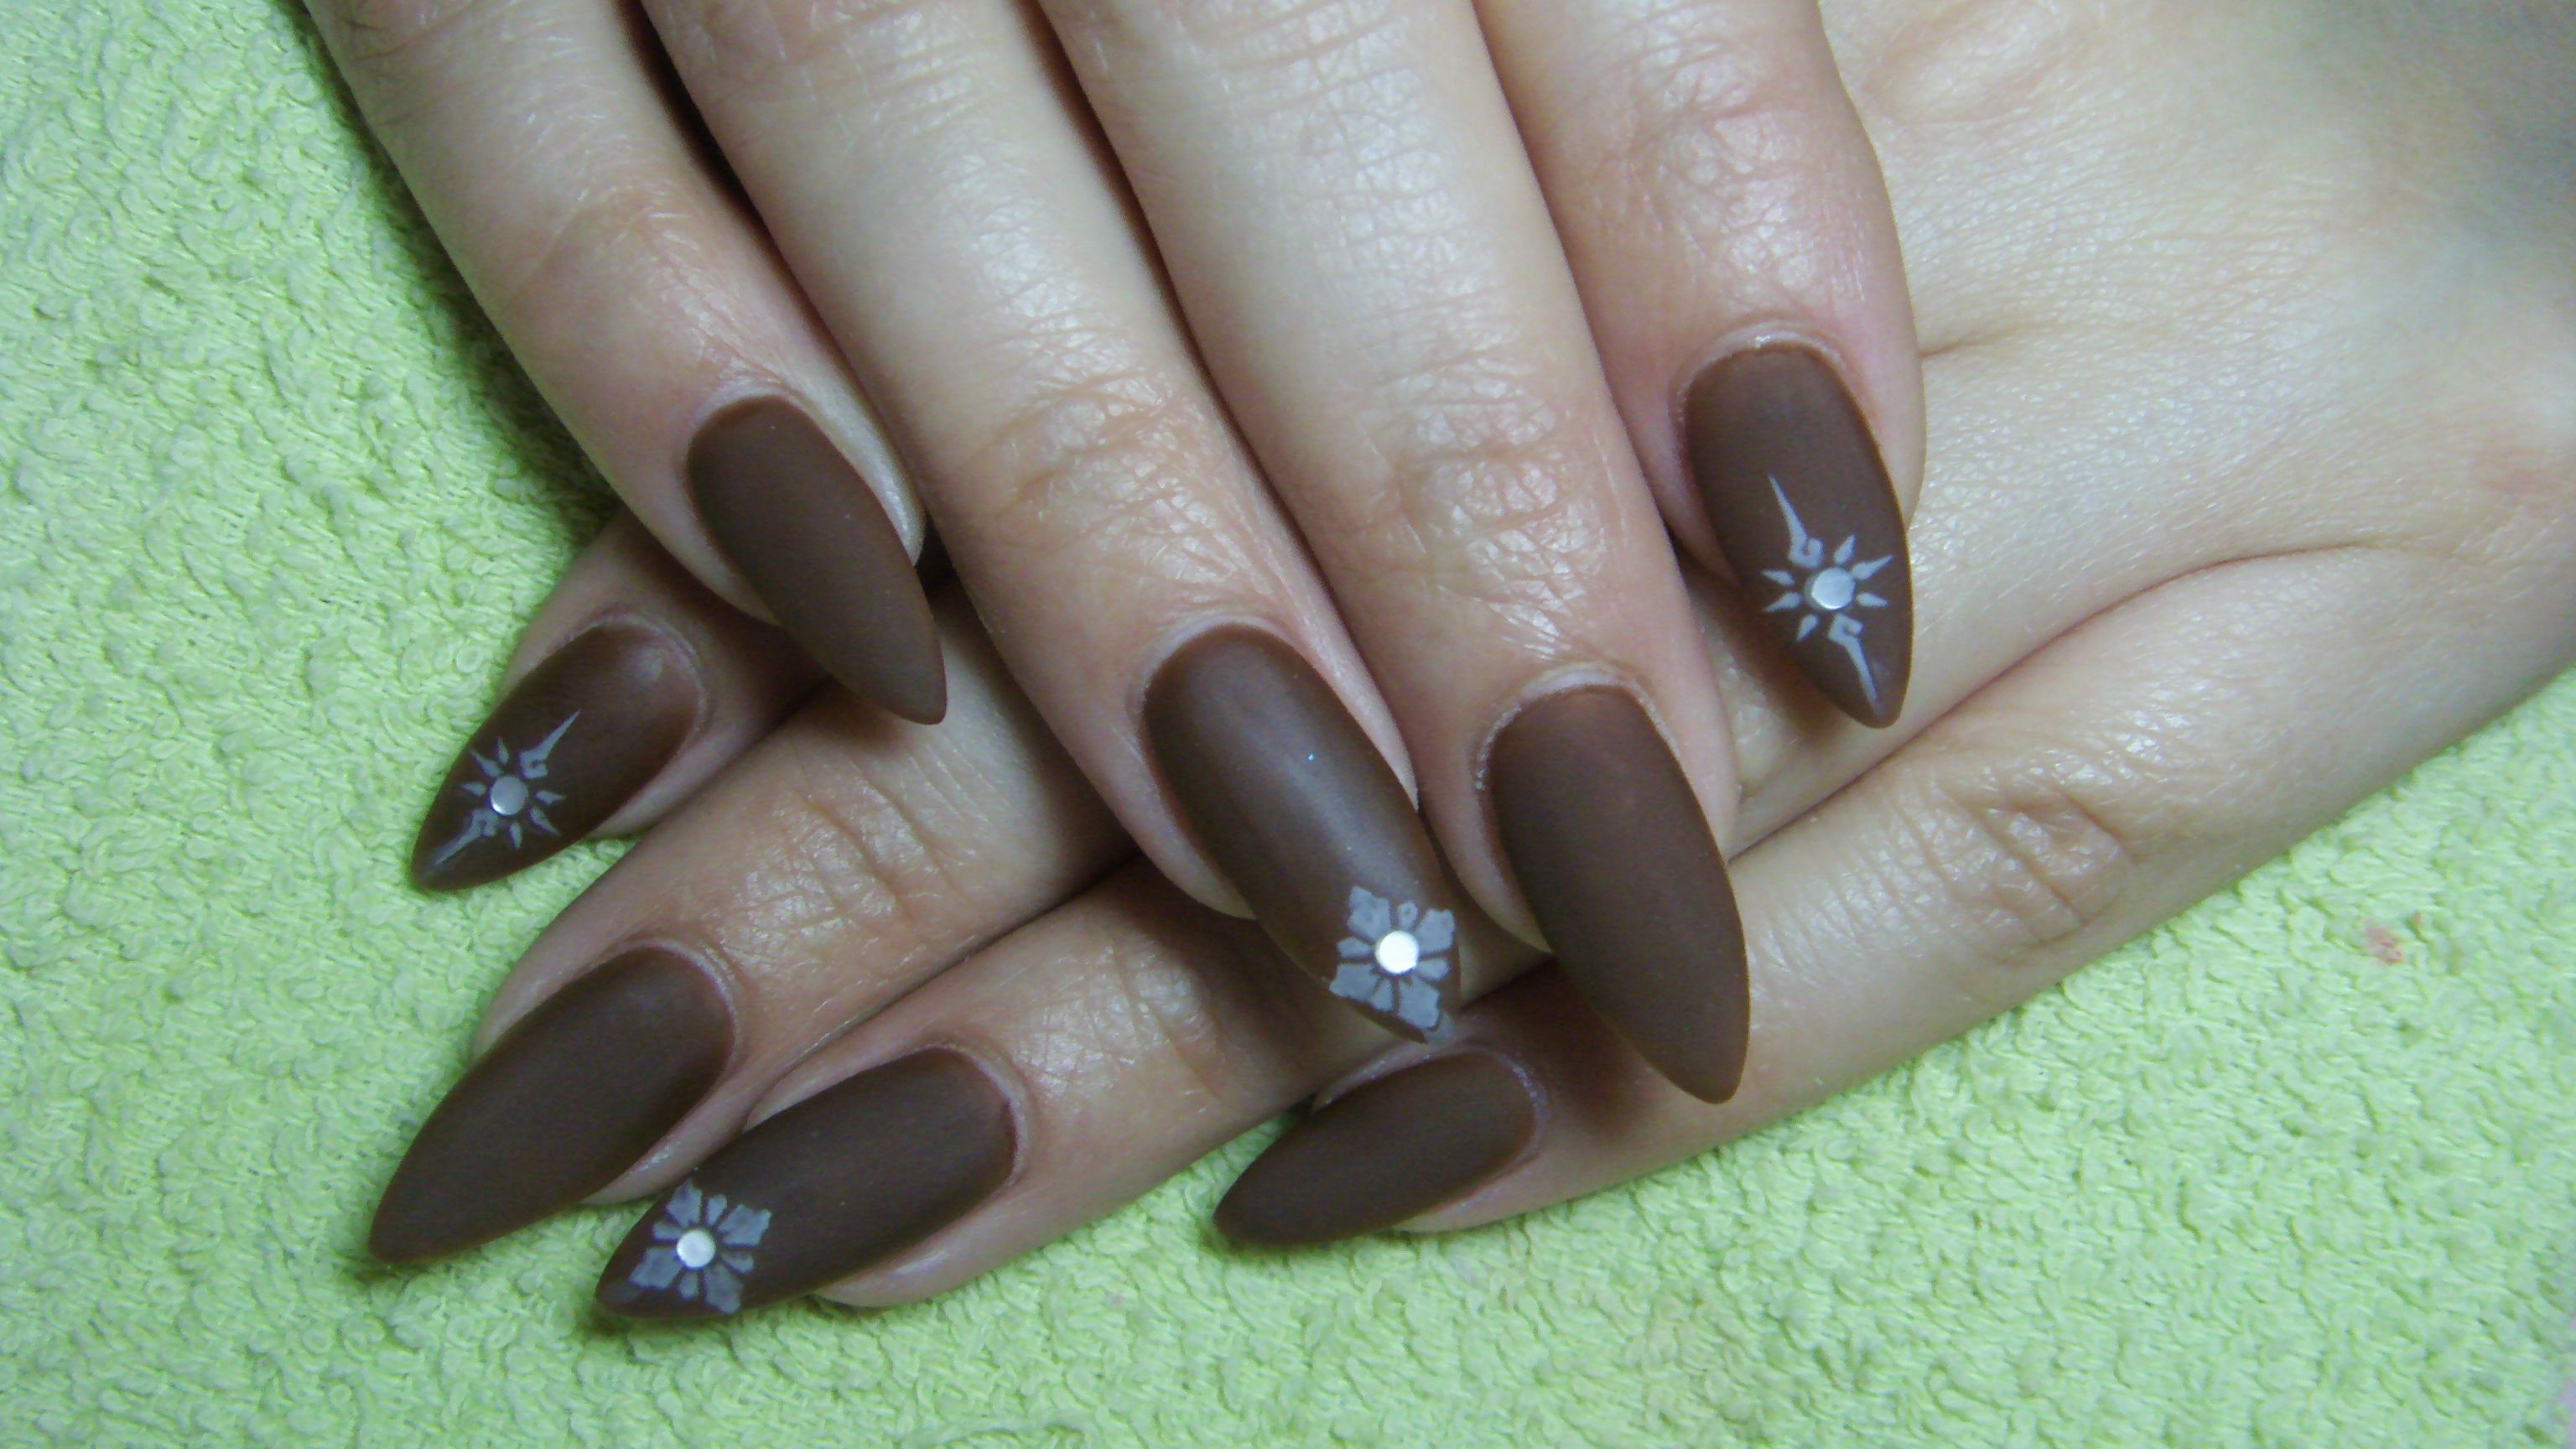 ... Matte Blue Nail Designs Almond in addition Black Matte Nail Polish. on